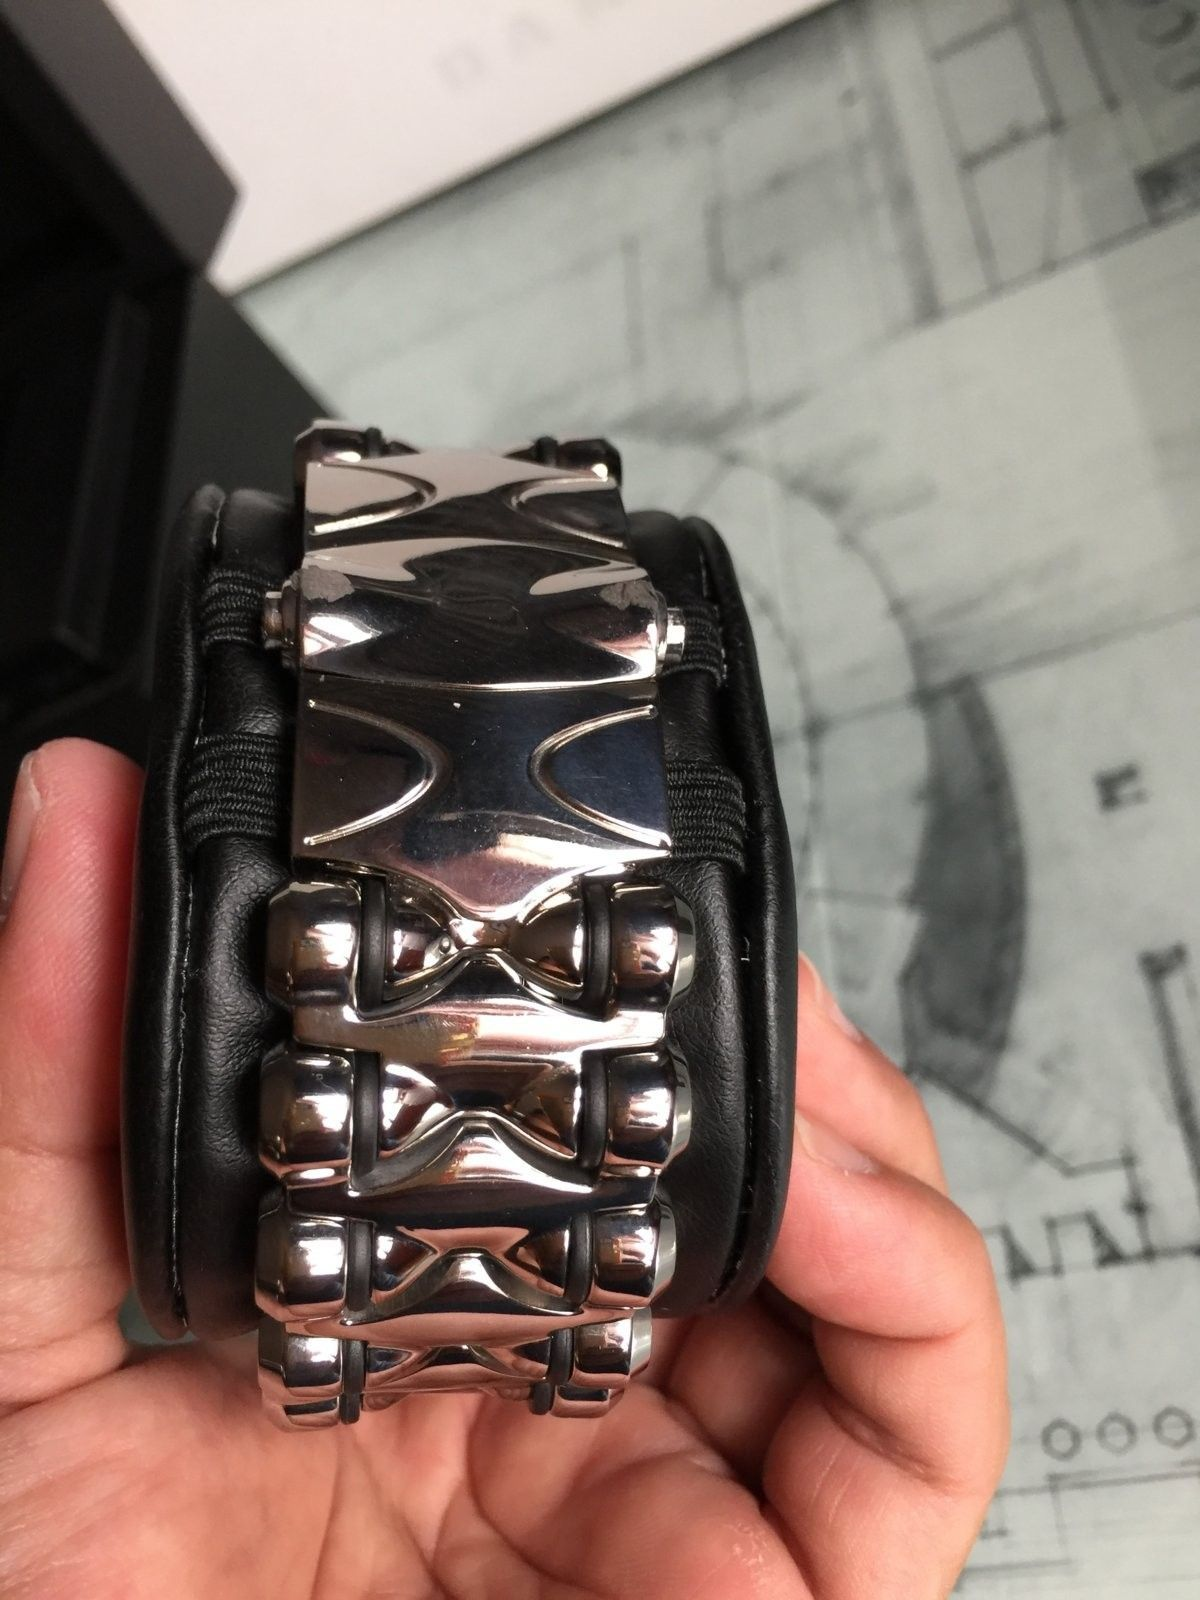 LNIB Polished Black Dial Minute Machine watch - IMG_6075.JPG